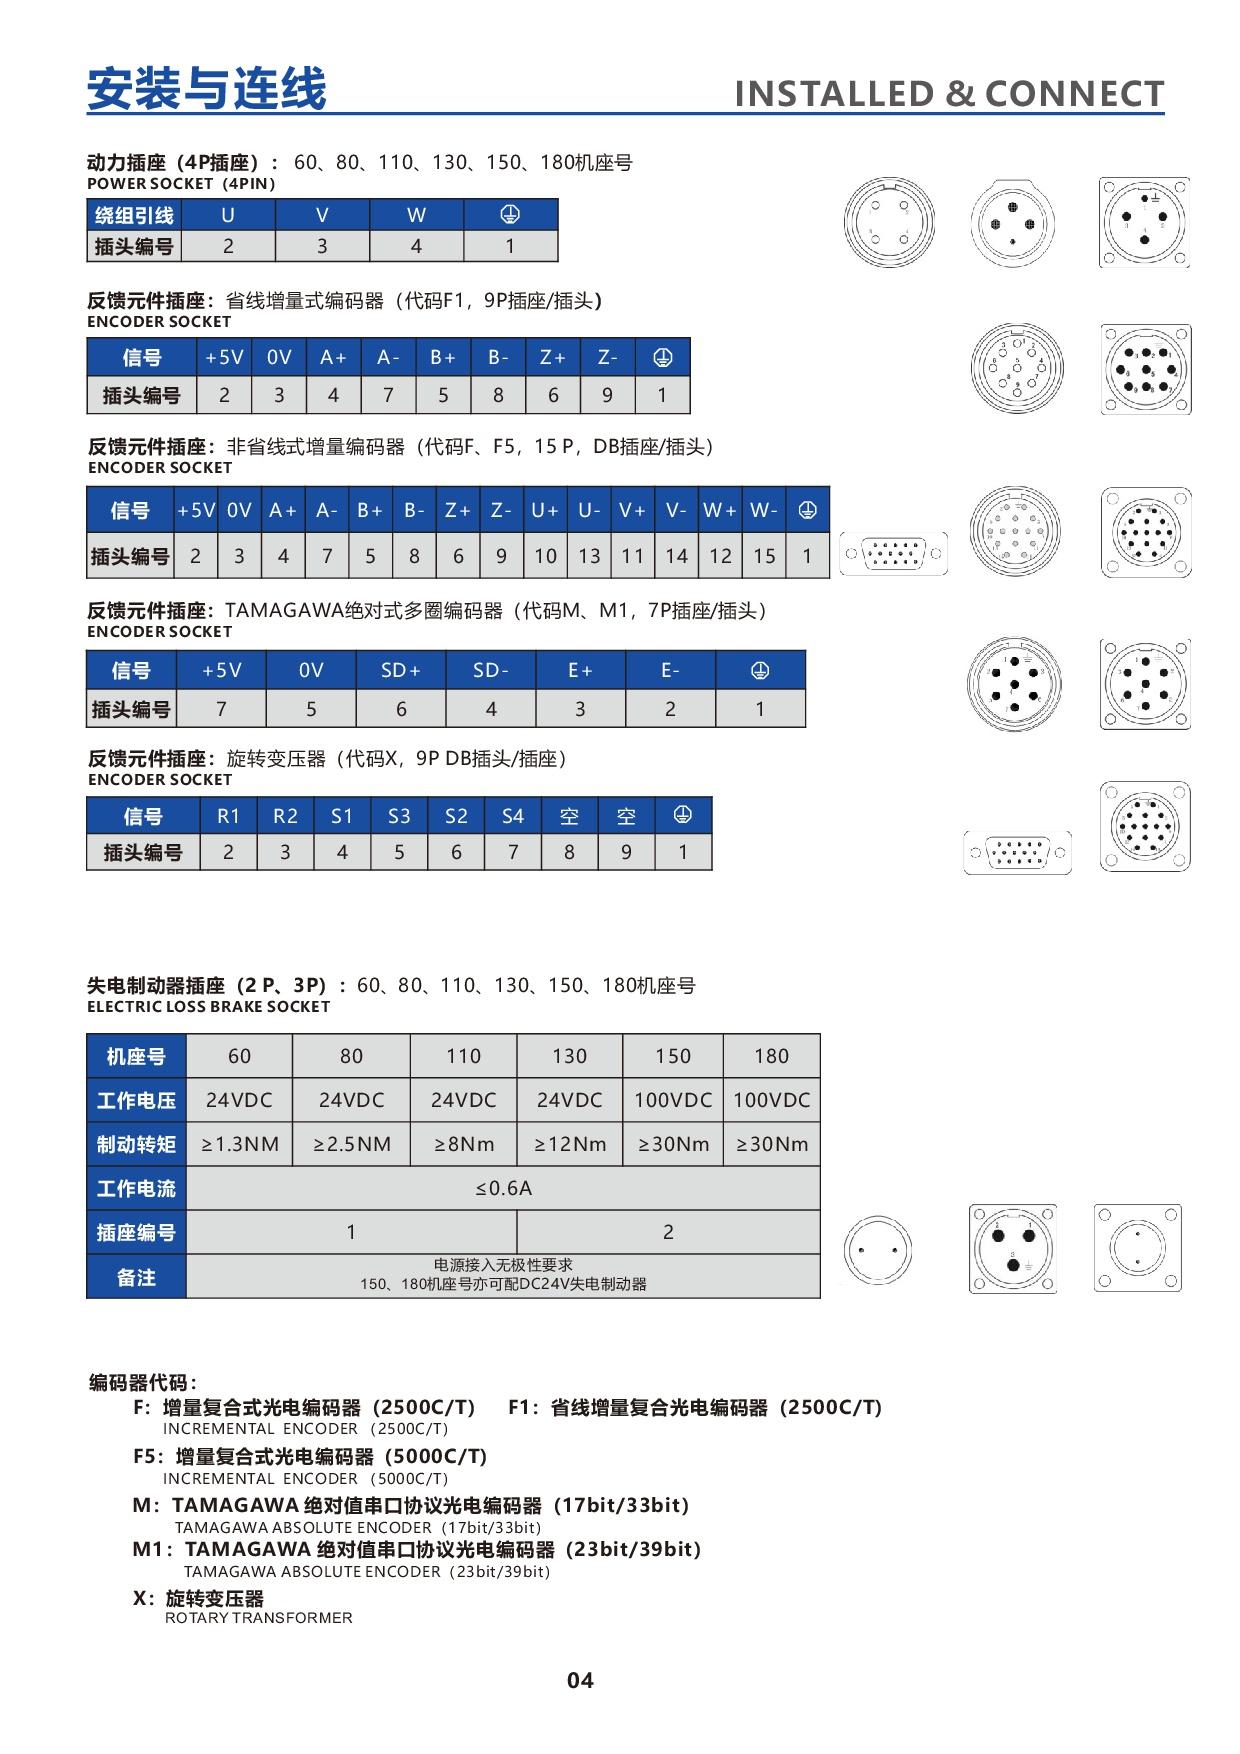 產品特性-2-HXDWH-2-installedconnect